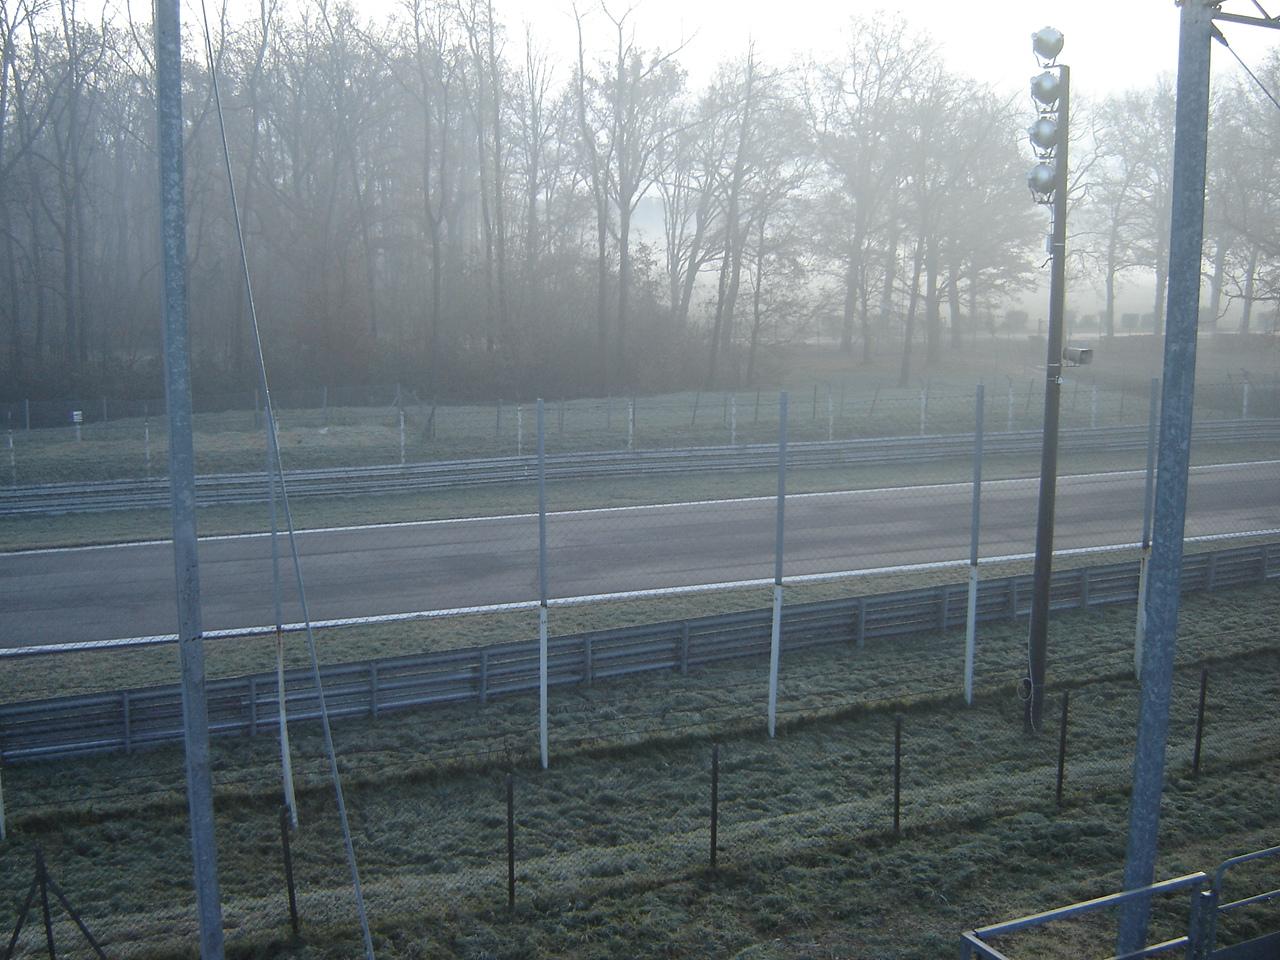 Circuito Ascari : Autodromo nazionale di monza tribuna uscita ascari b